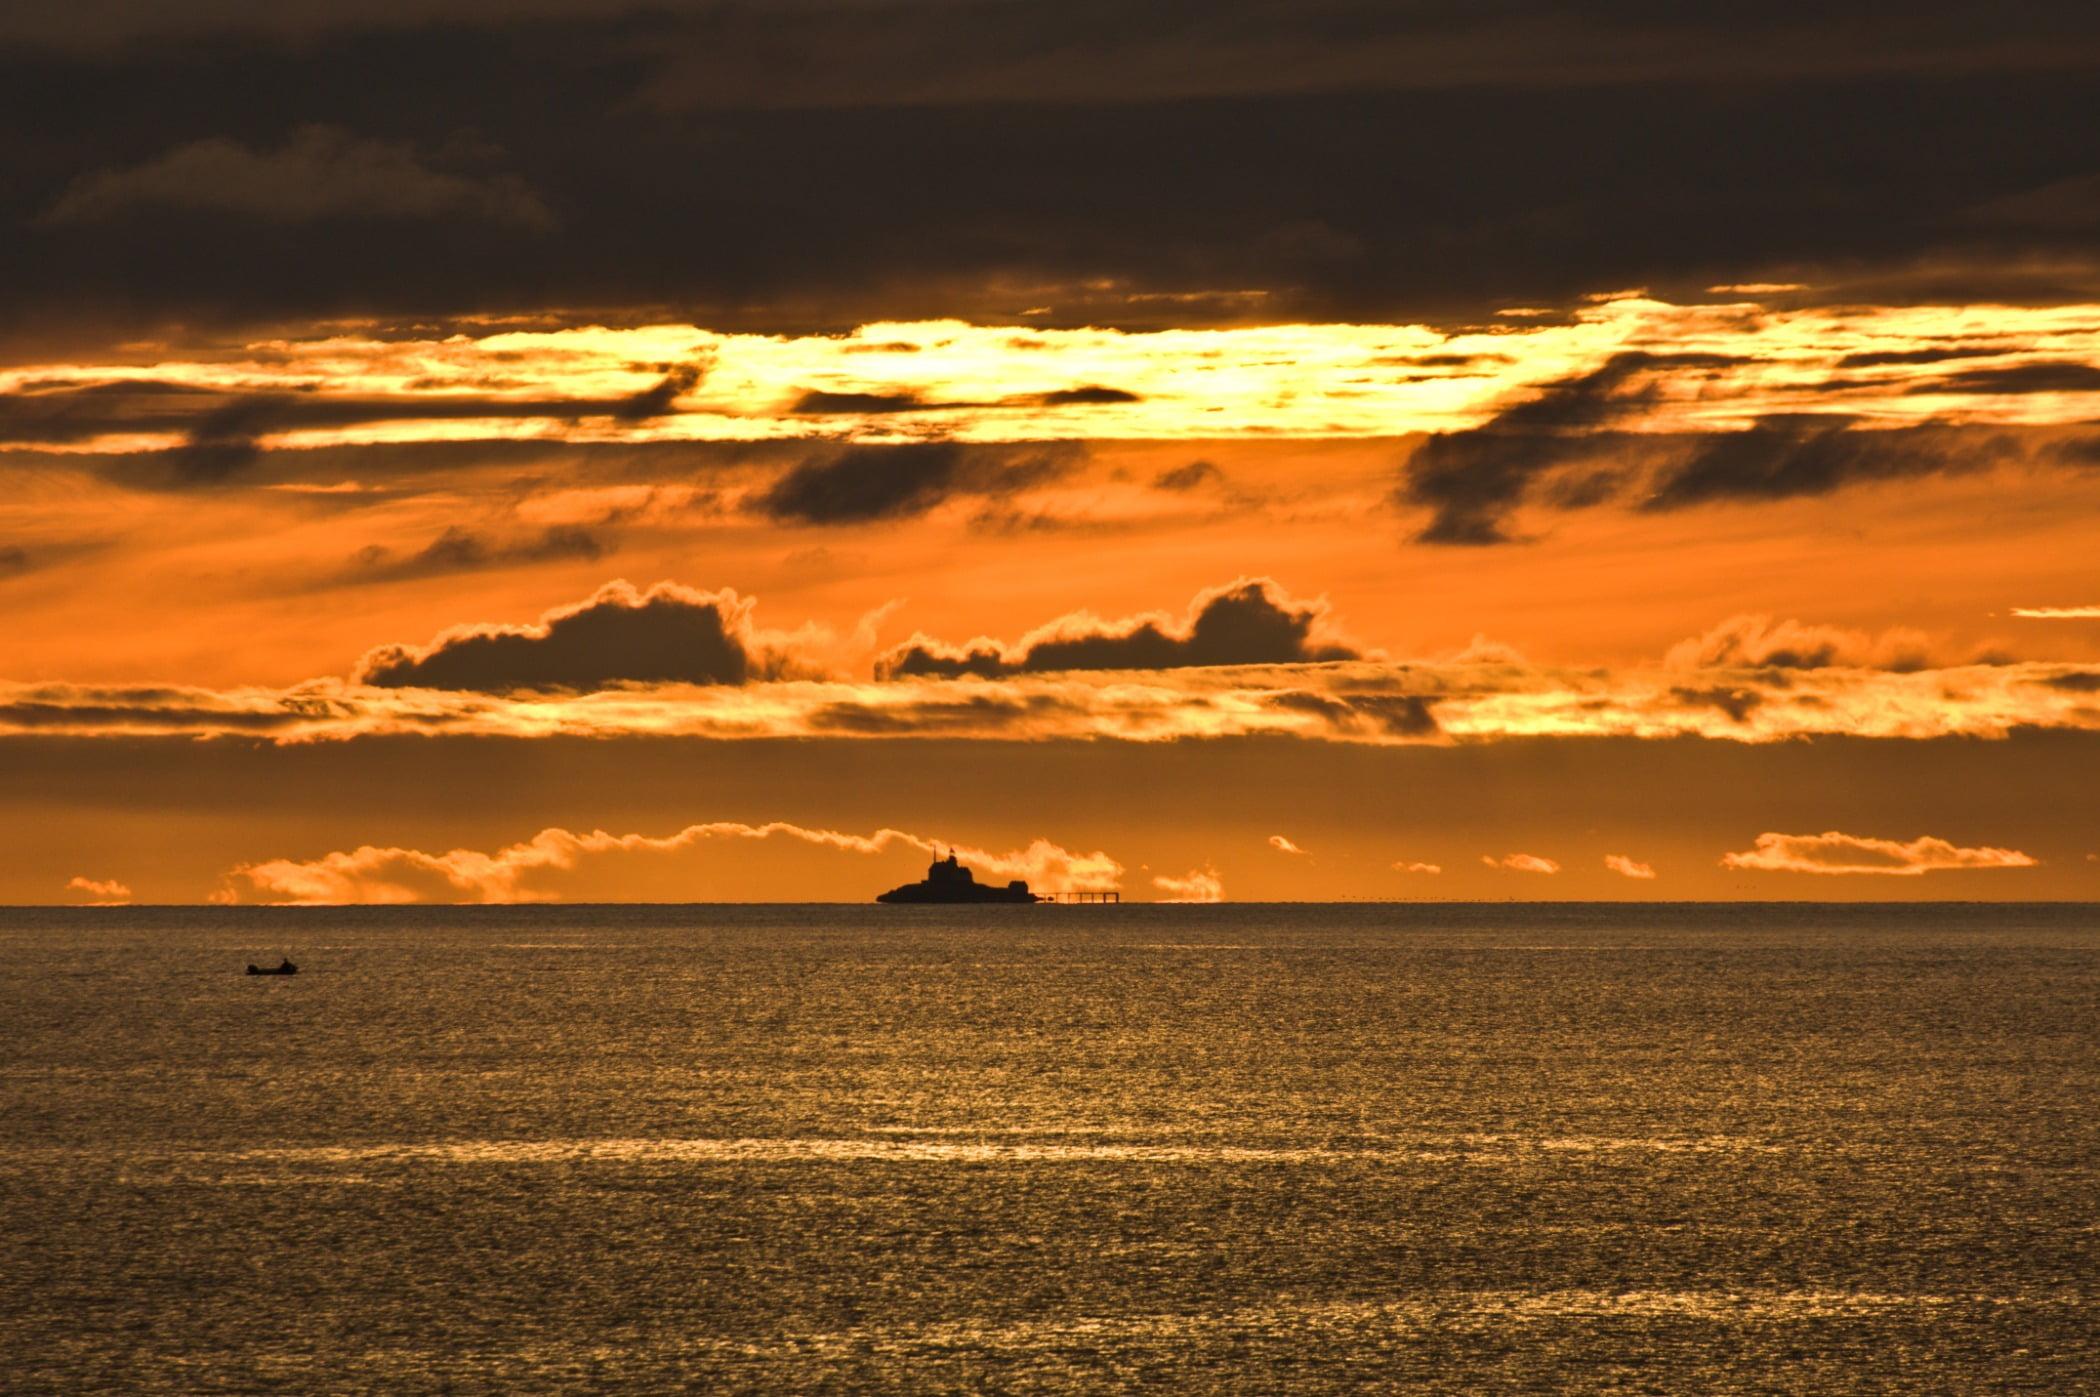 Natural landscape, Cloud, Water, Sky, Atmosphere, Ecoregion, Afterglow, Nature, Orange, Sunlight